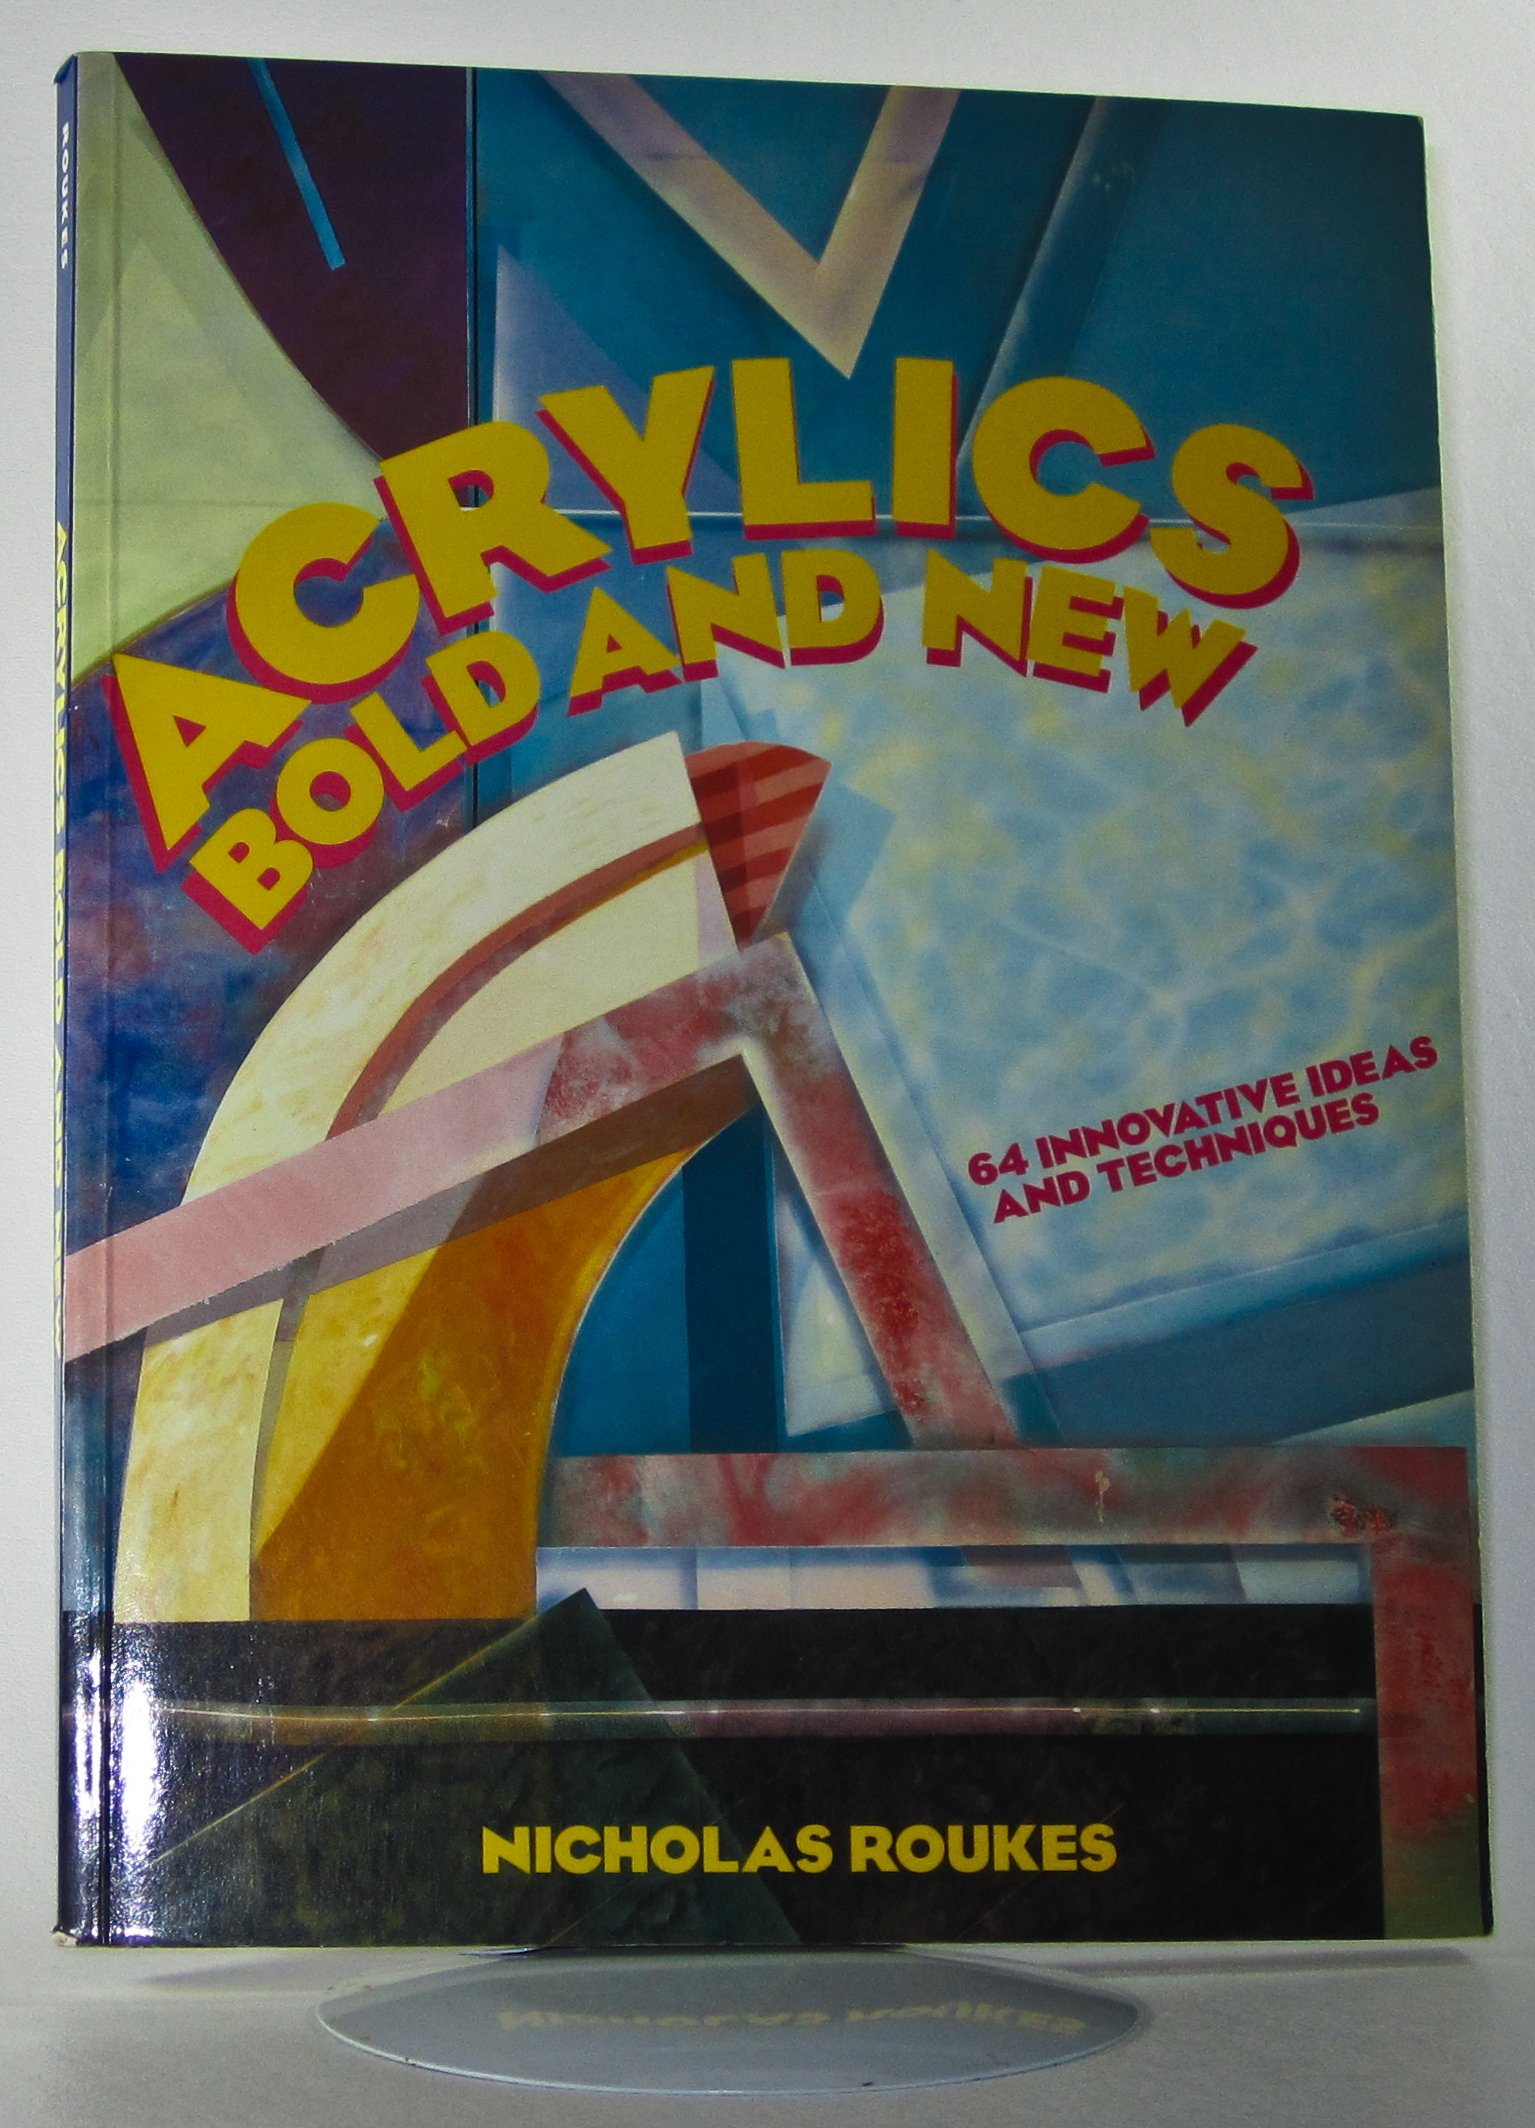 Acrylics Bold and New